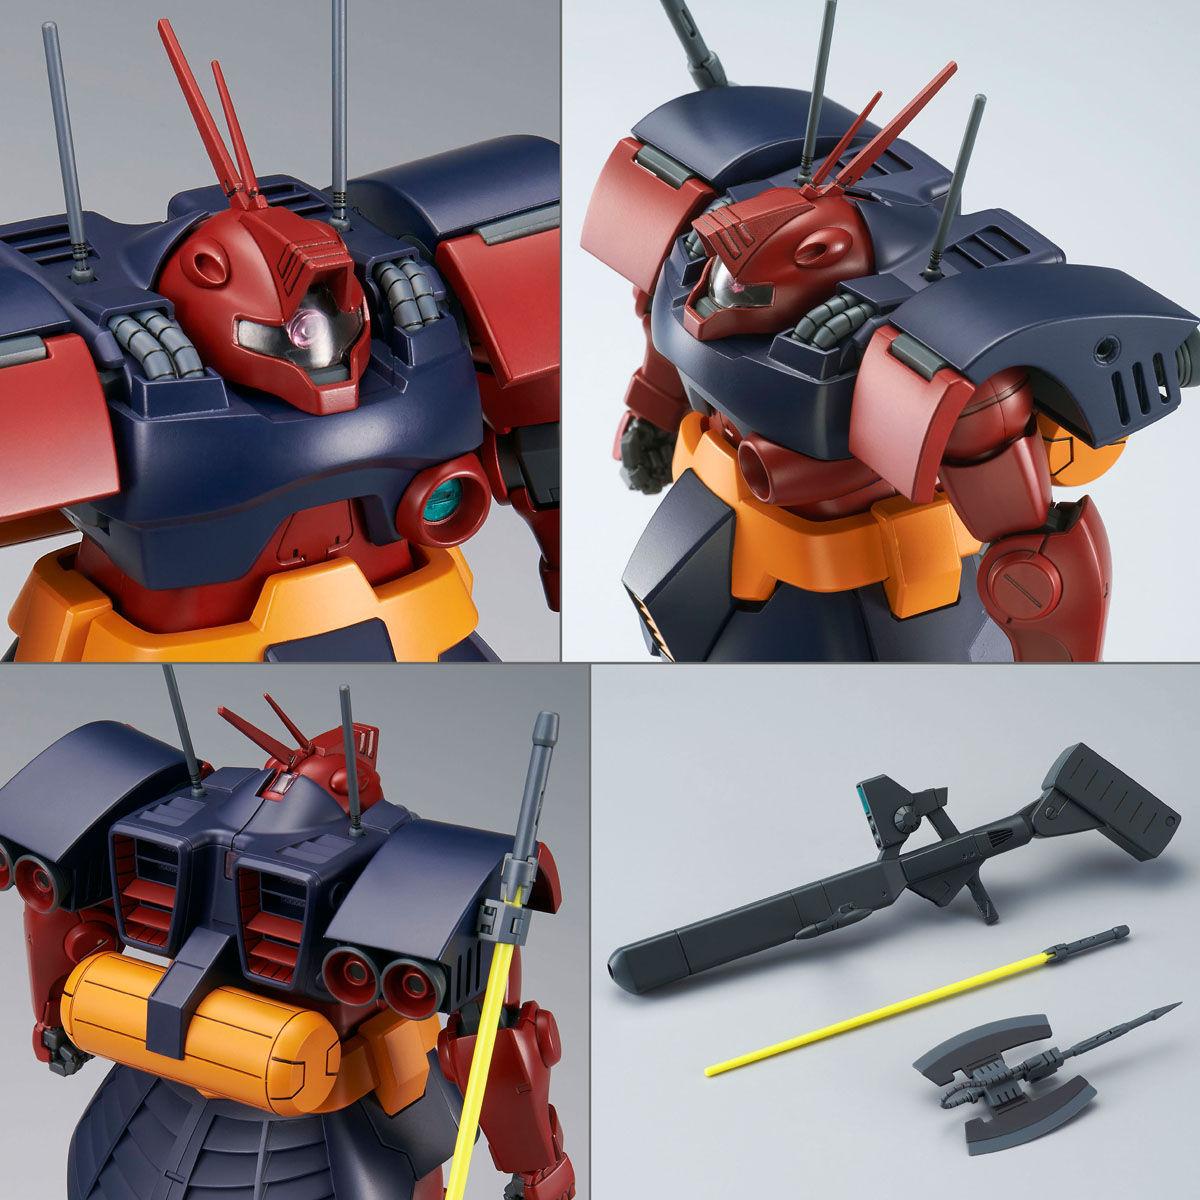 P-Bandai MG 1/100 DWADGE CUSTOM (Ace Pilot Log Series) No.13 images, info